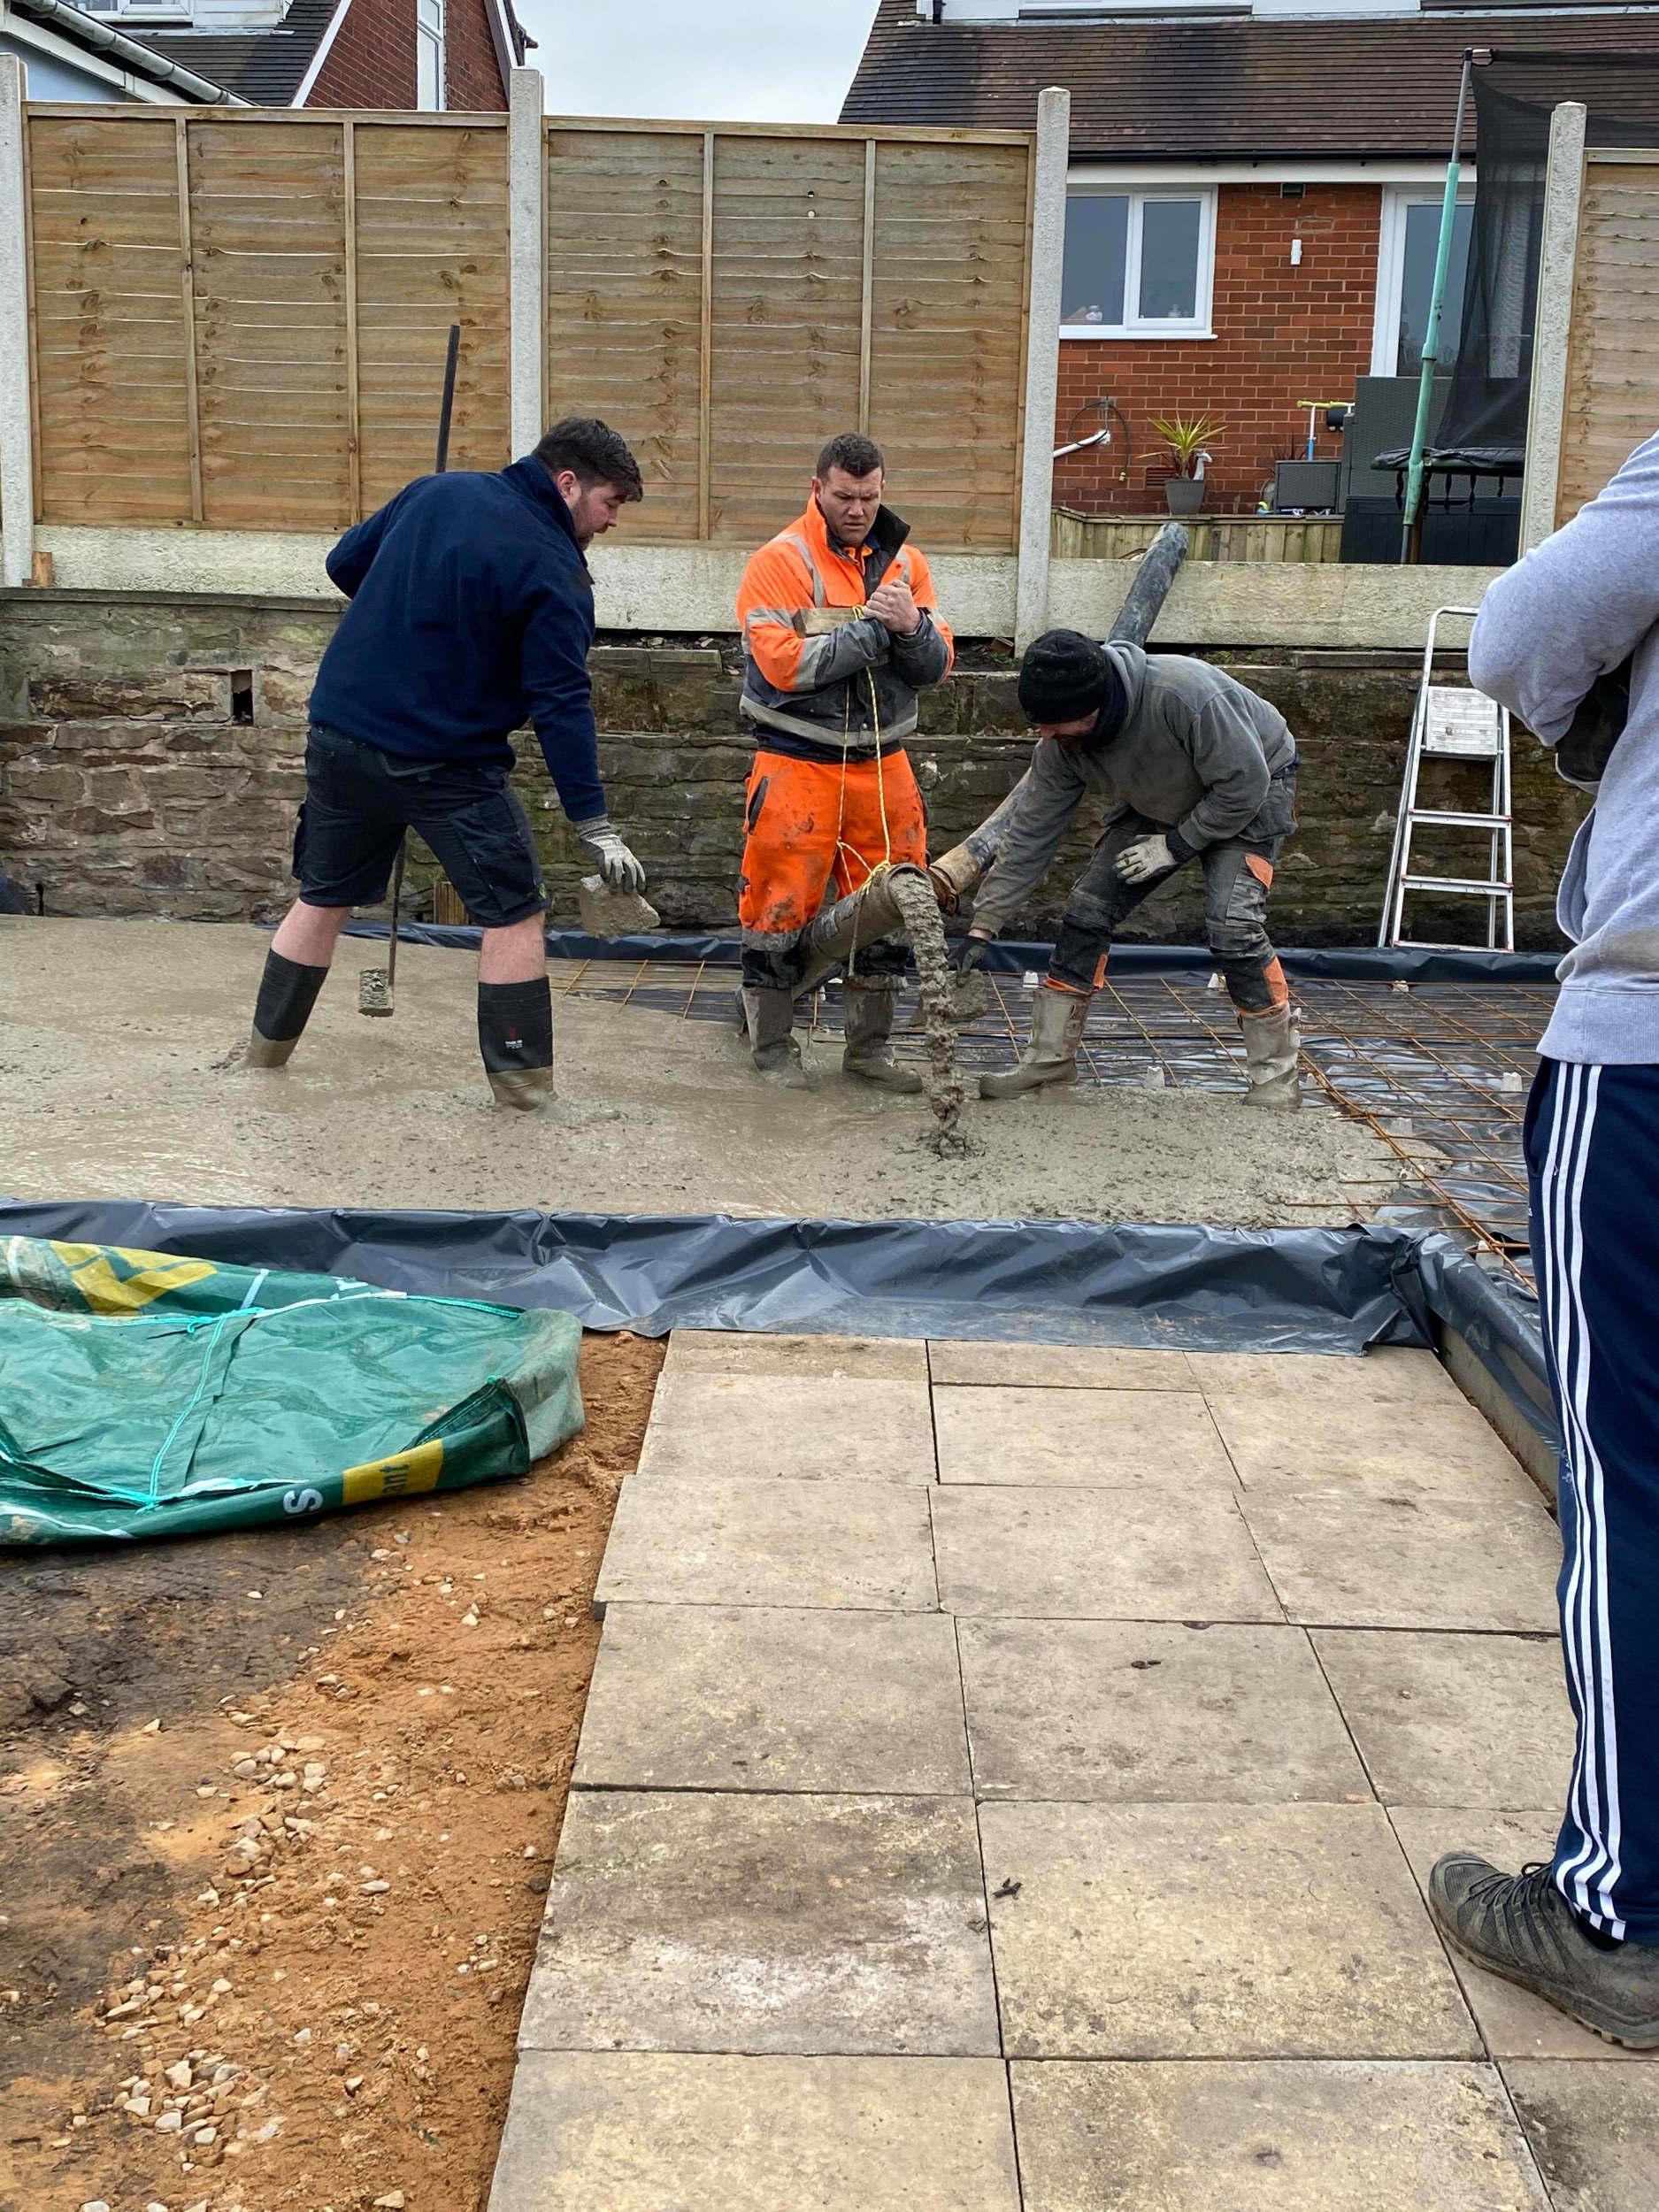 Building the back garden pub | DIY News UK